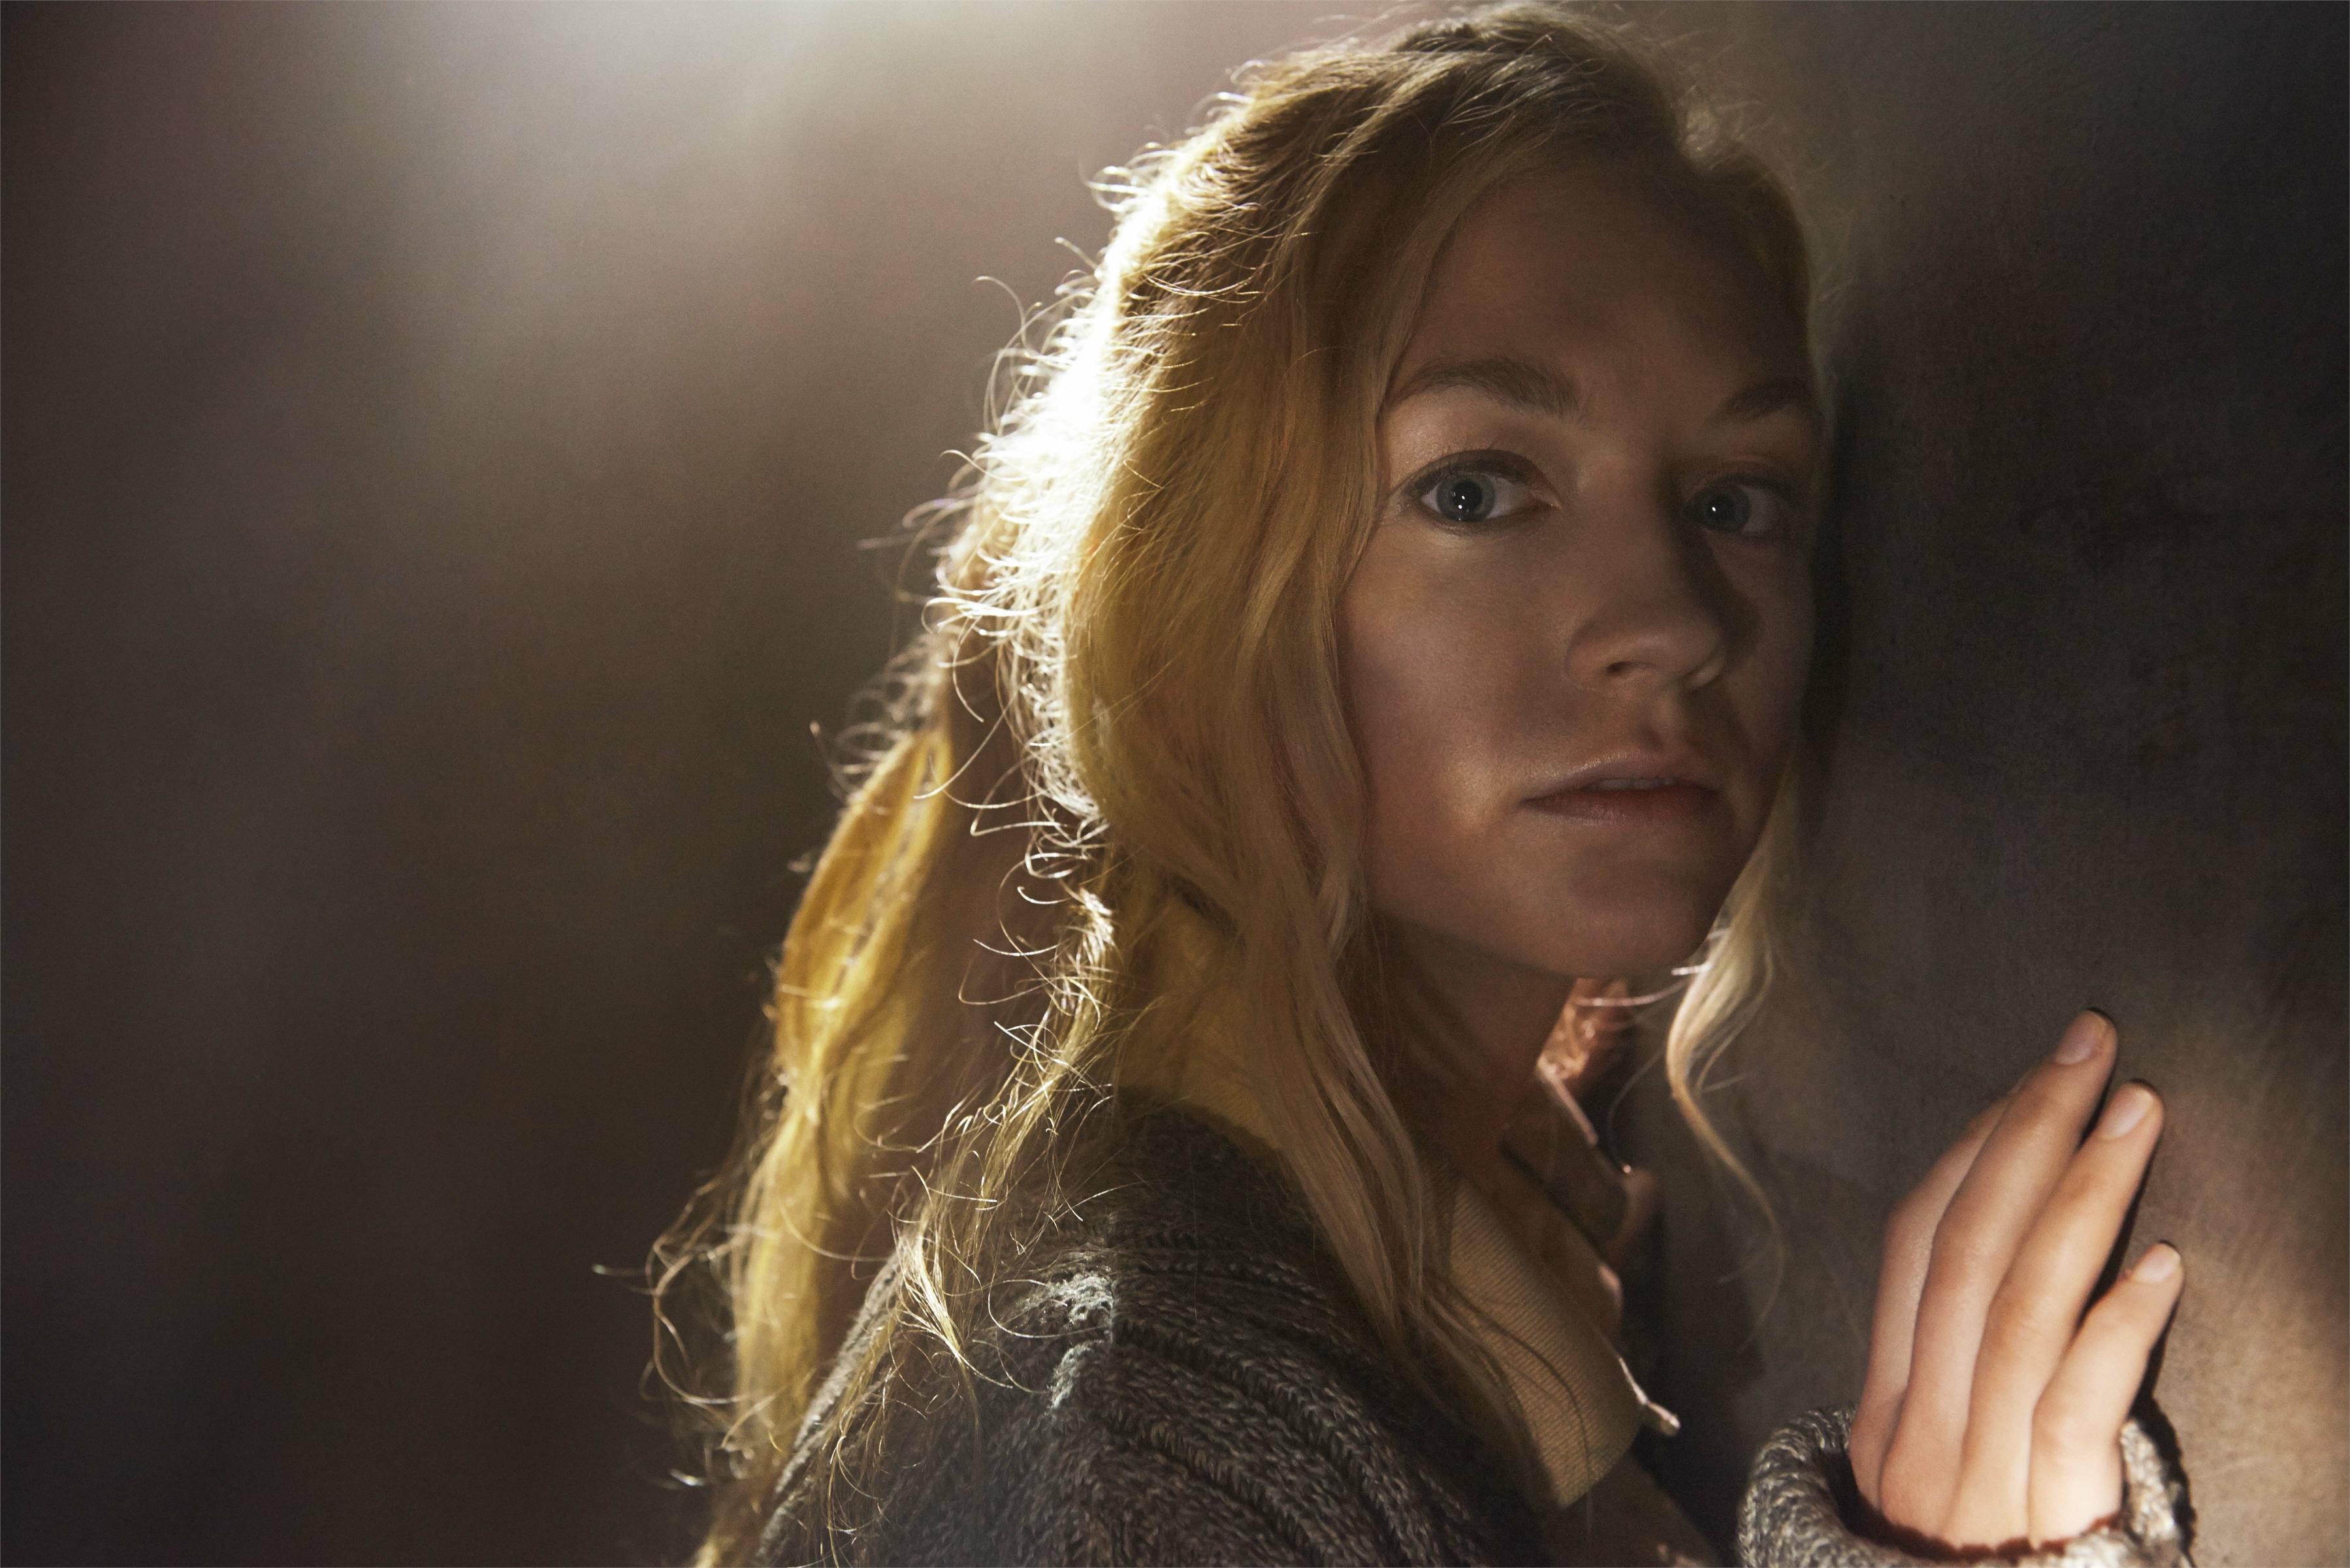 Beth-Greene-The-Walking-Dead-5-Temporada-Personagens-HQ-006